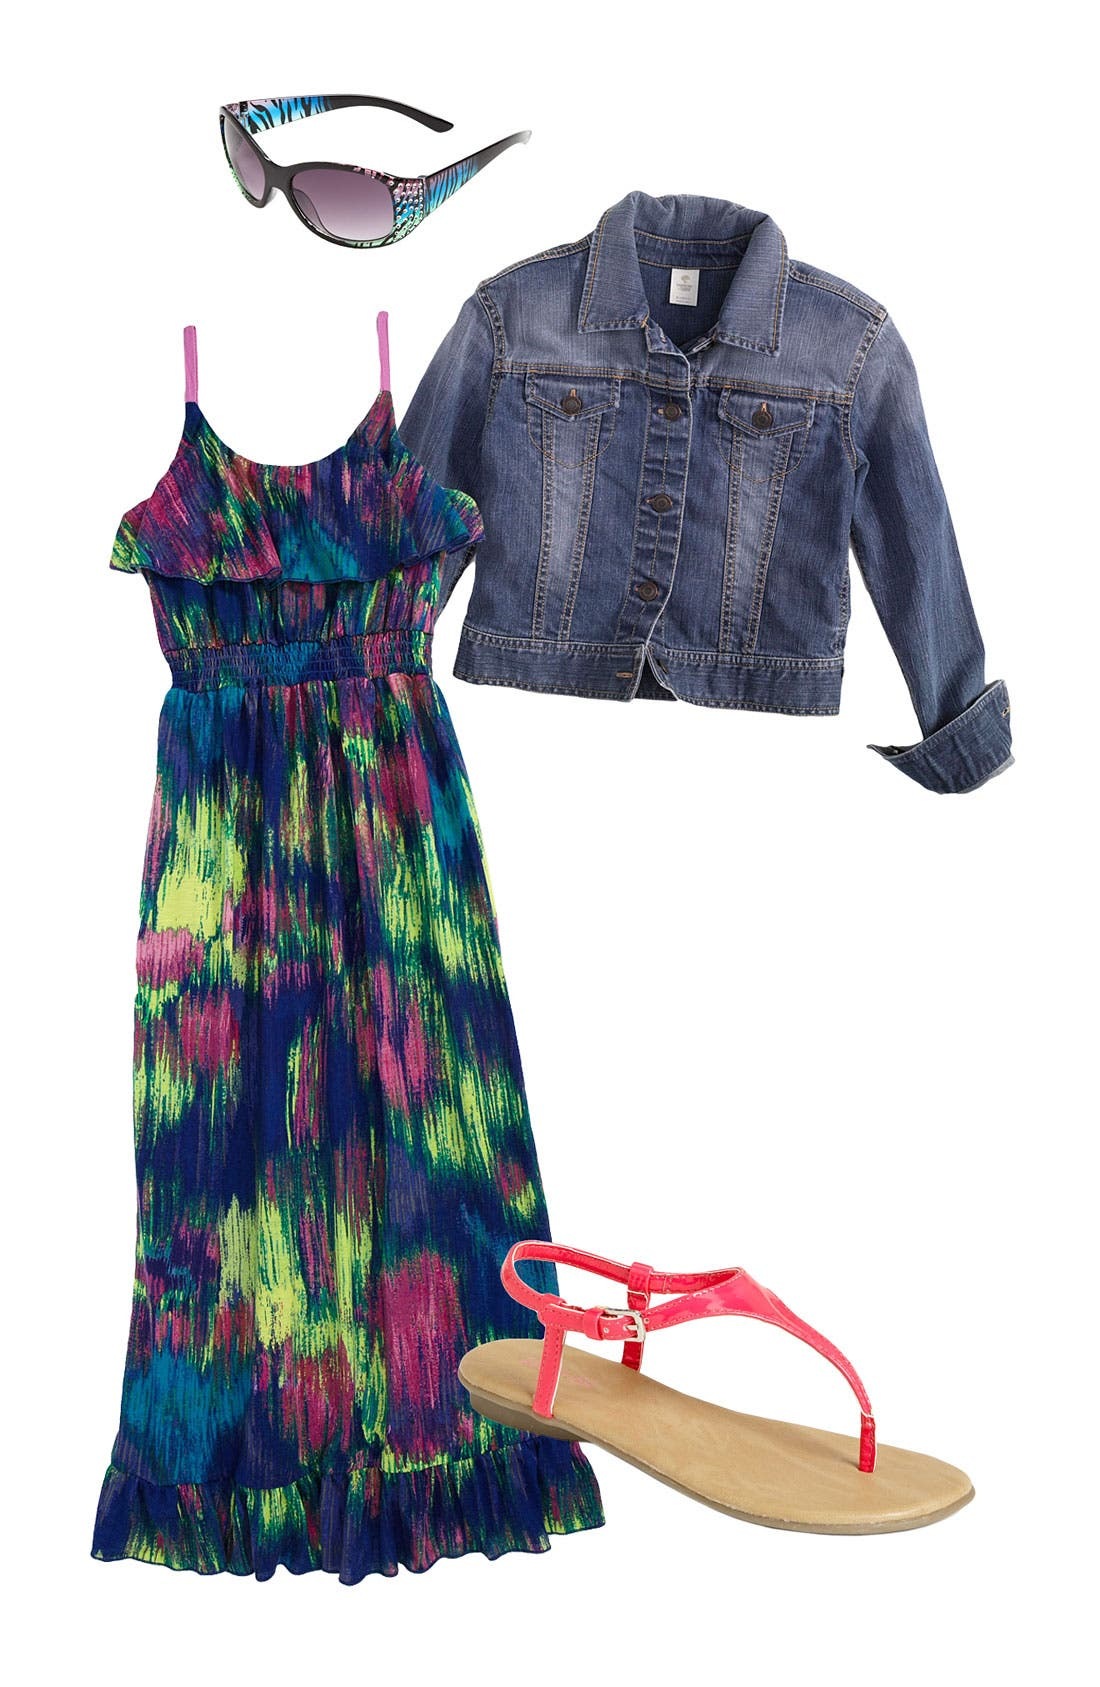 Alternate Image 1 Selected - Fire Maxi Dress & Tucker + Tate Denim Jacket (Big Girls)